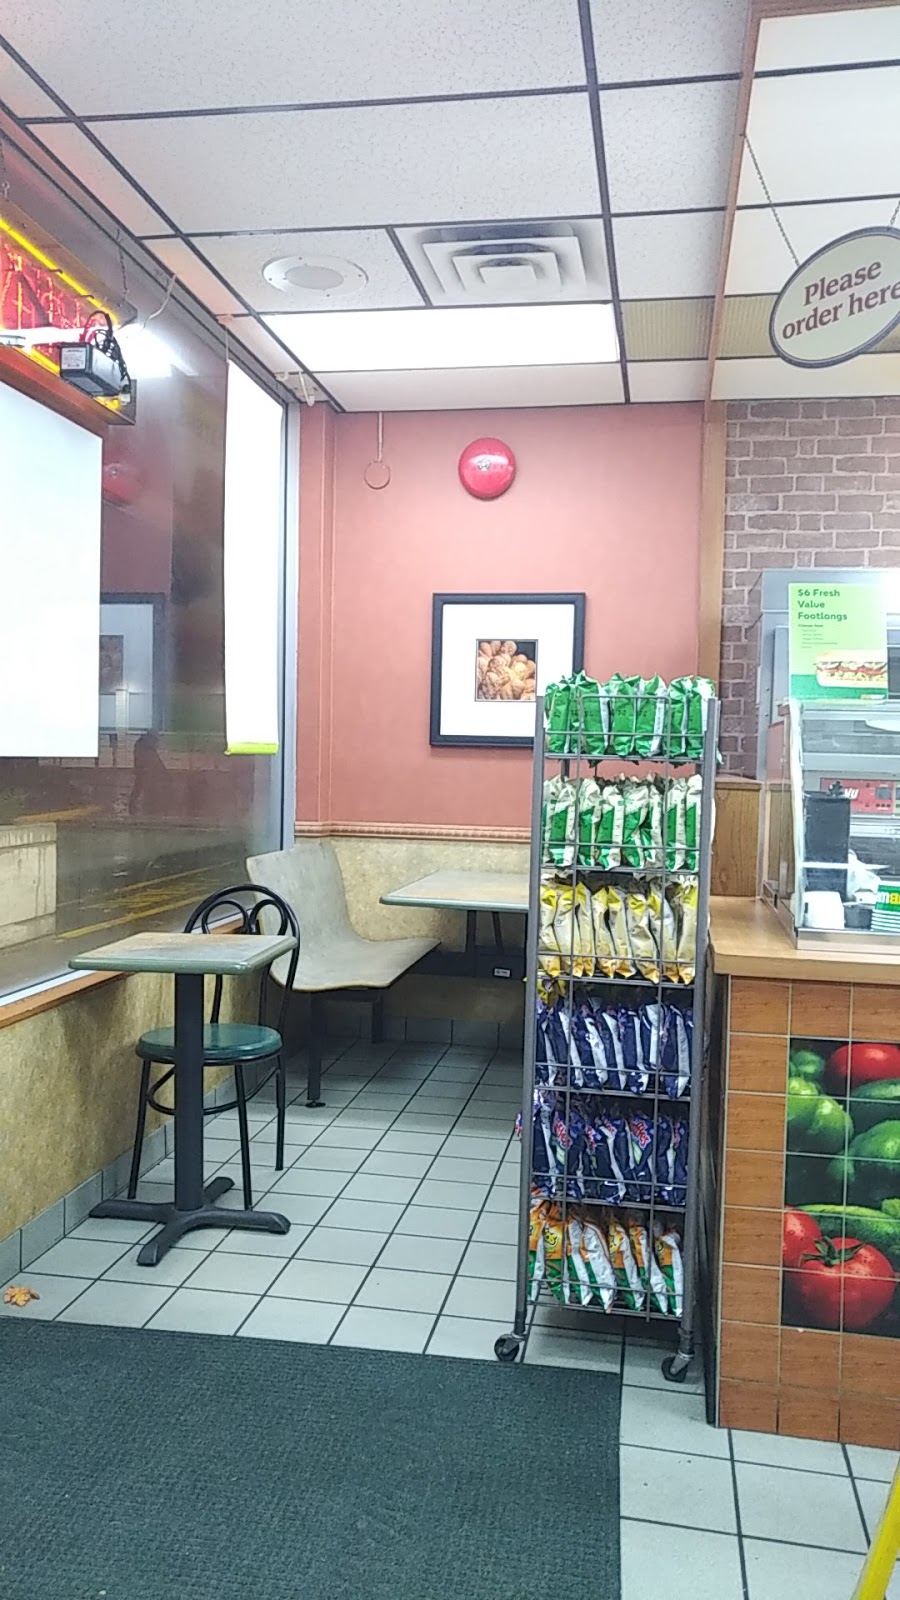 Subway | restaurant | Gorge Shopping Center, 2935 Tillicum Rd, Victoria, BC V9A 2A6, Canada | 2503806611 OR +1 250-380-6611